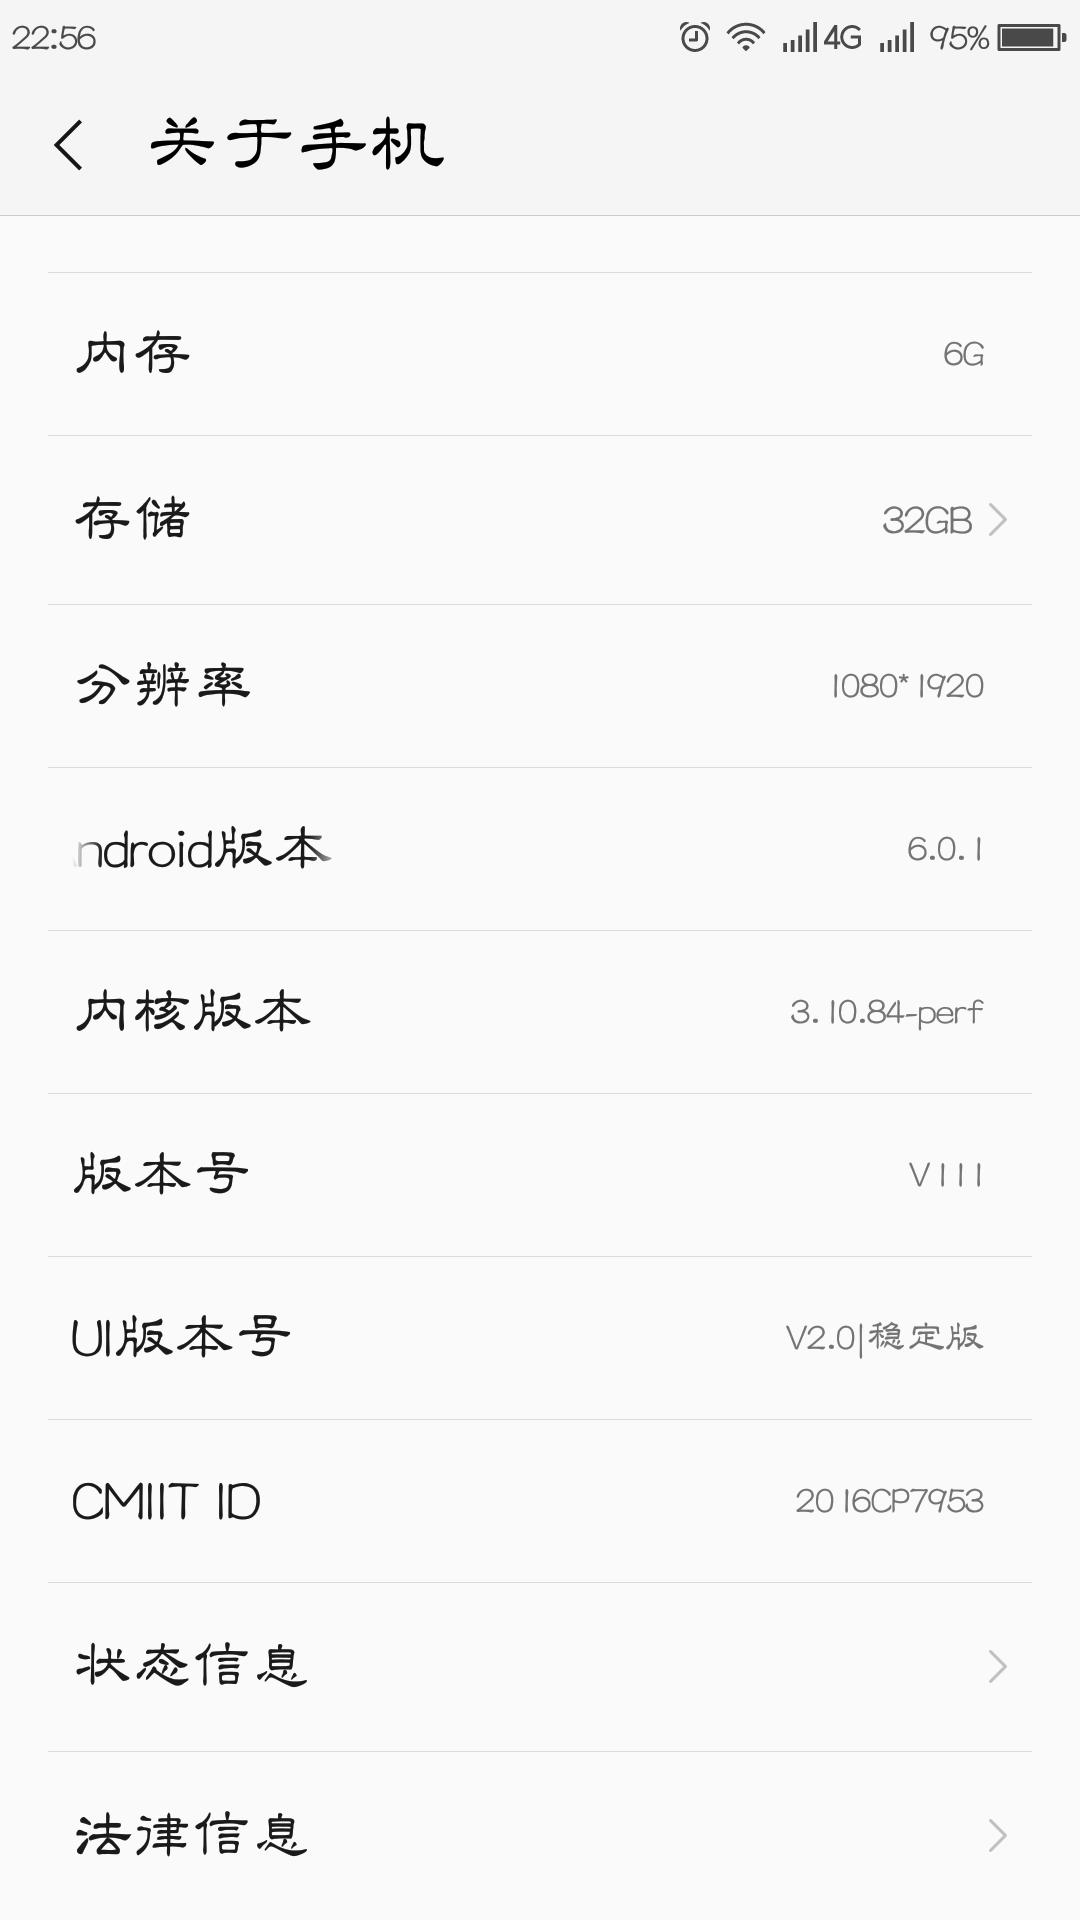 Screenshot_2017-05-26-22-56-45.png